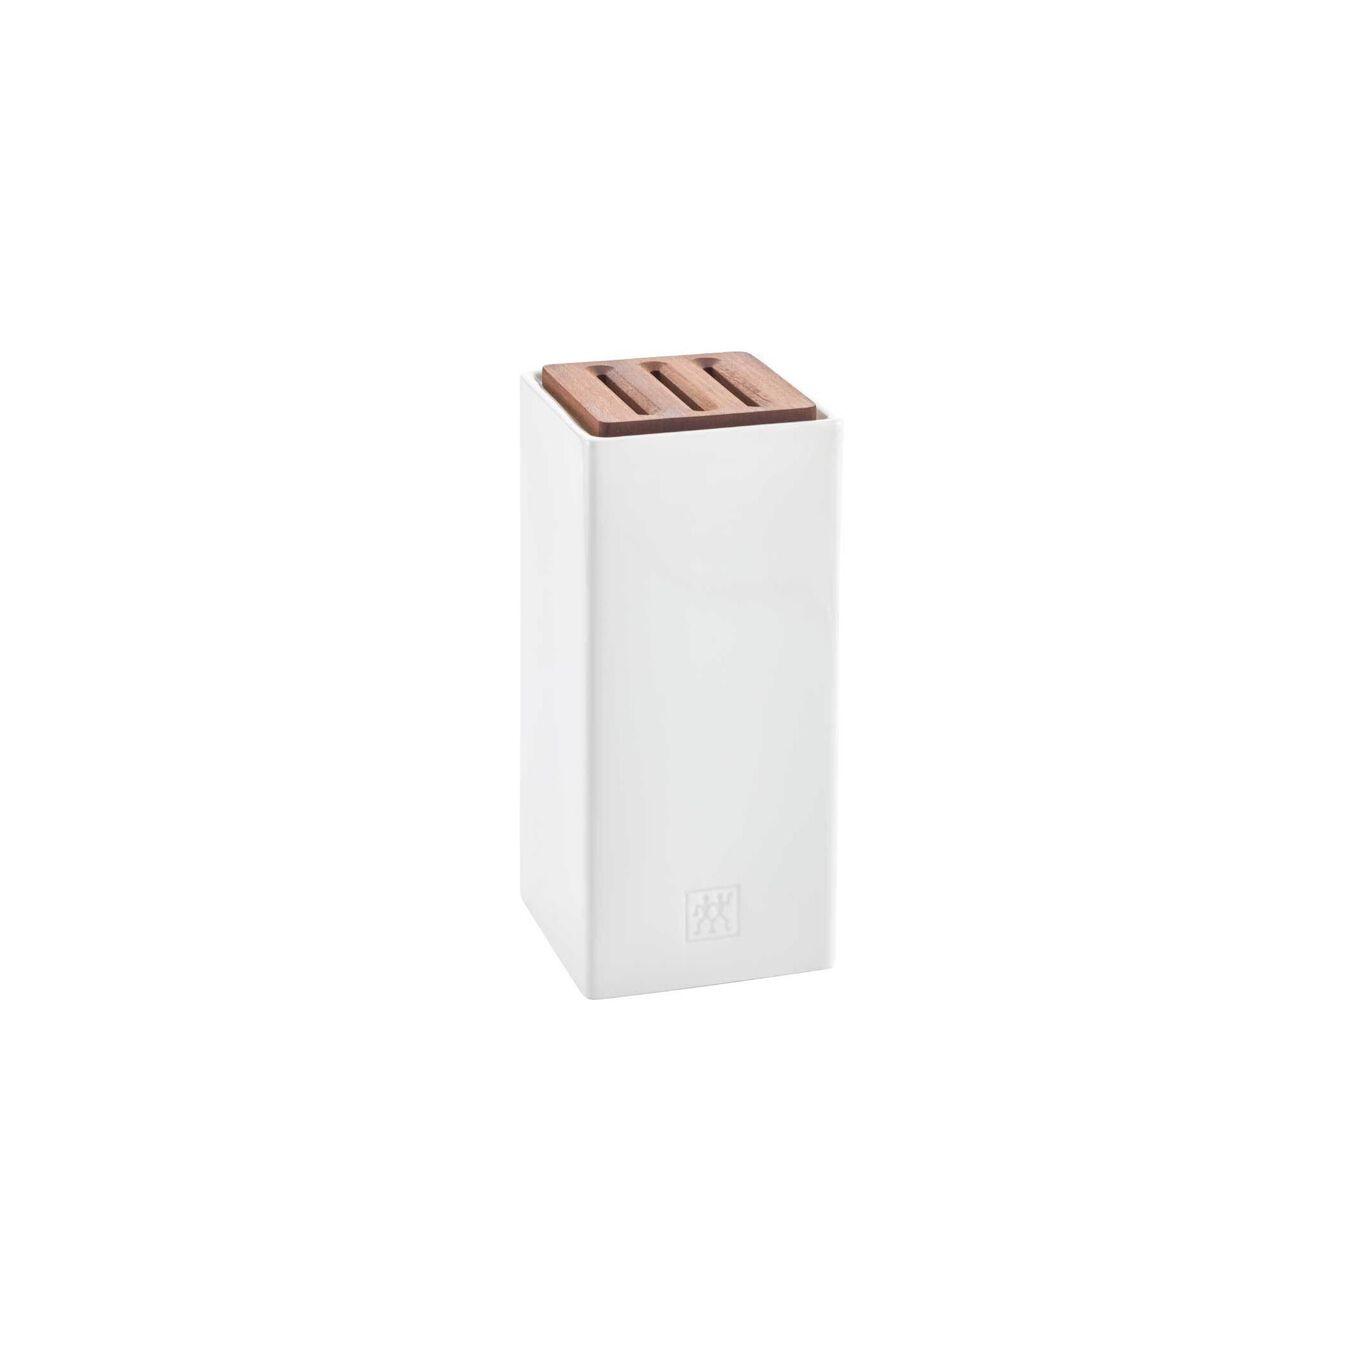 Set ceppo verticale - 4-pz., ceramica,,large 5